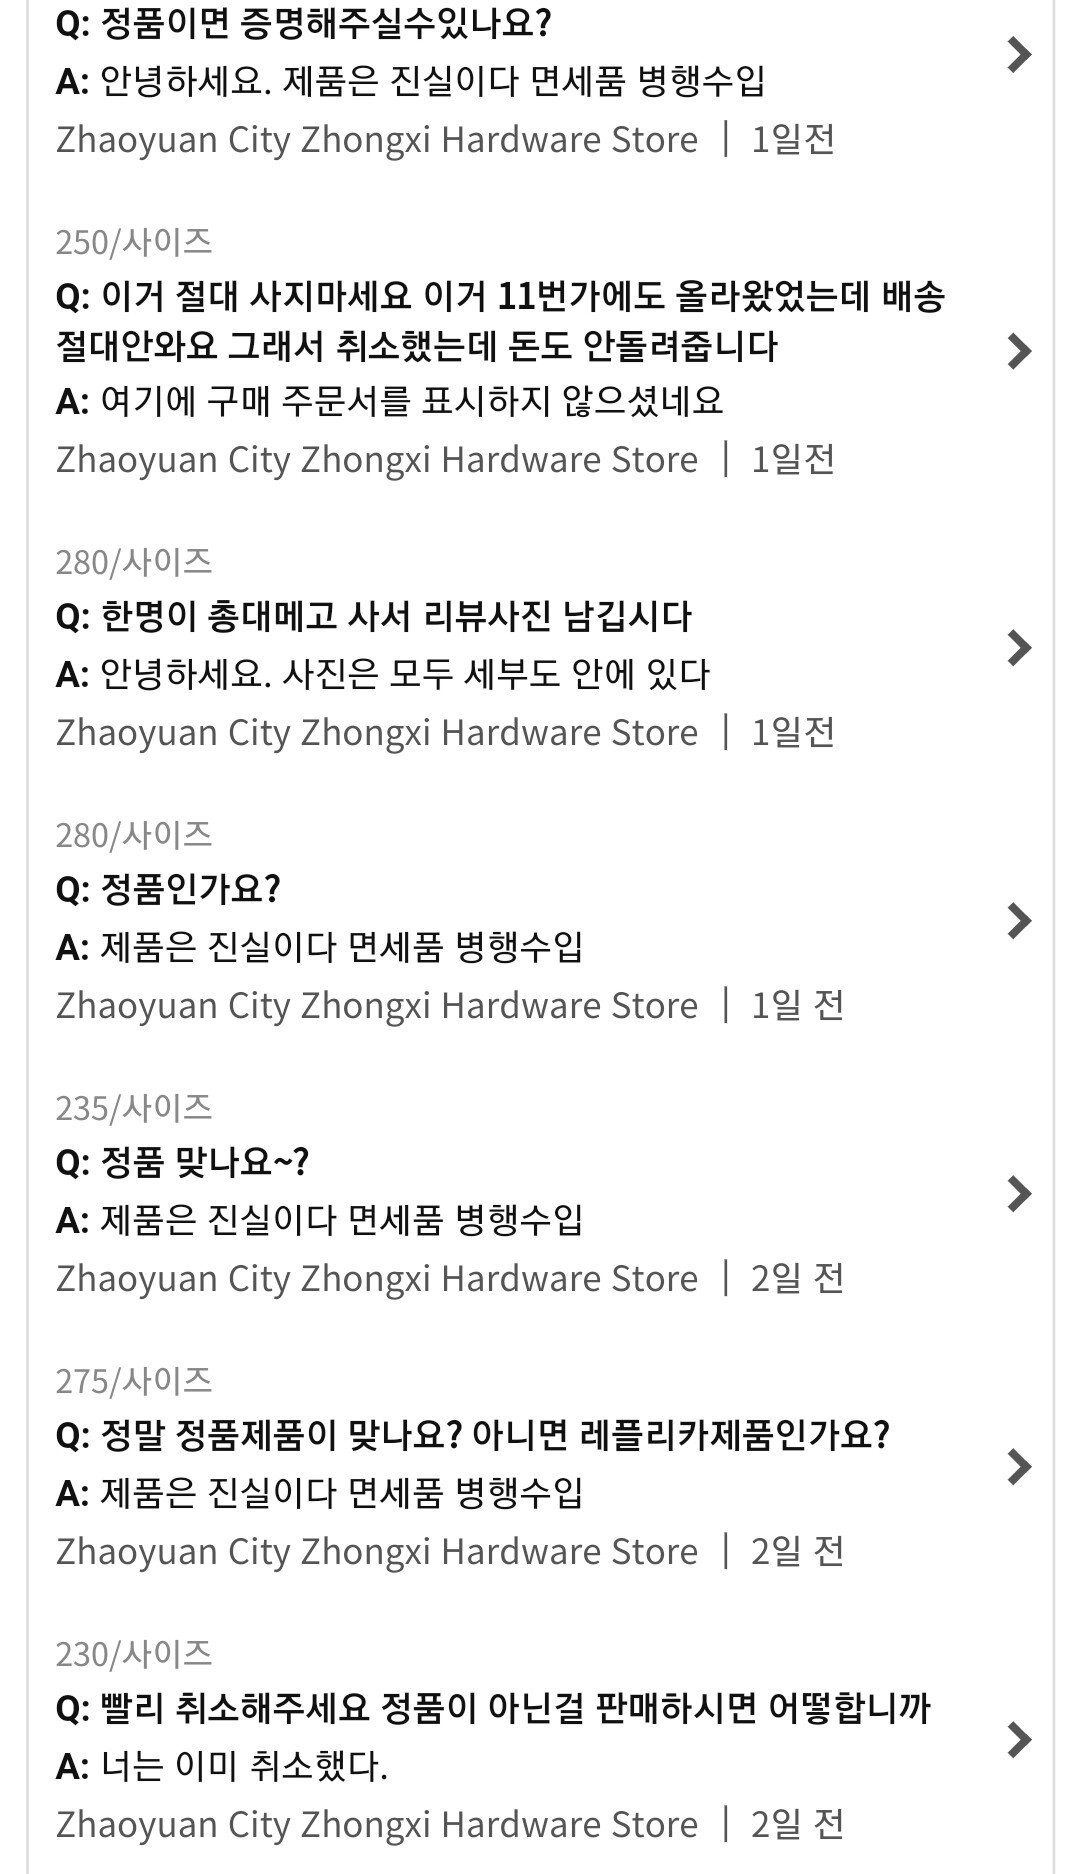 Screenshot_20191211-155818_Samsung Internet.jpg 50만원짜리 신발 5만원에 파는 곳ㄷㄷ